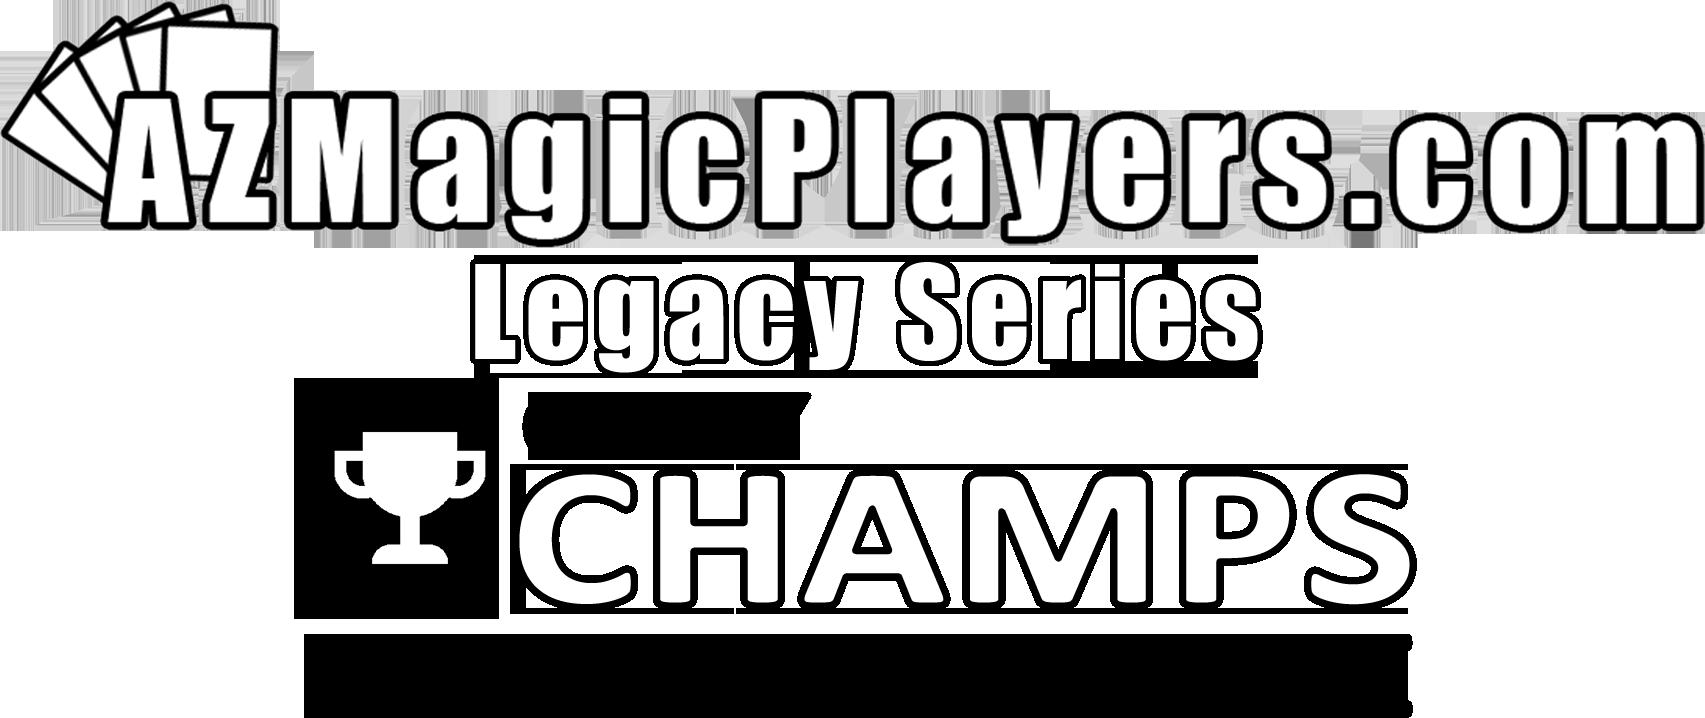 Tempe City Championships